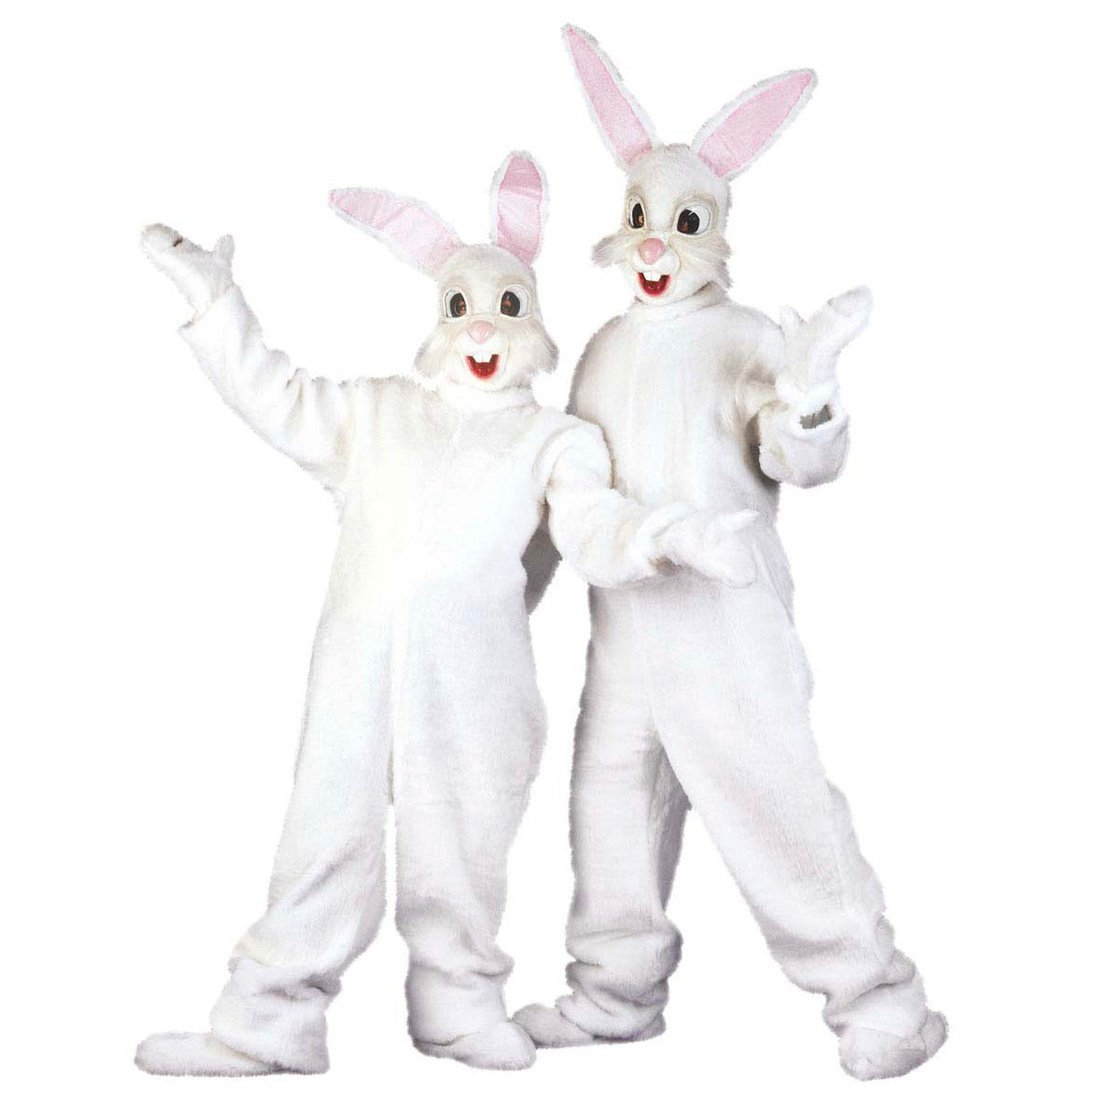 Disfraz de conejo completo peluche traje mono felpa pascua traje animal